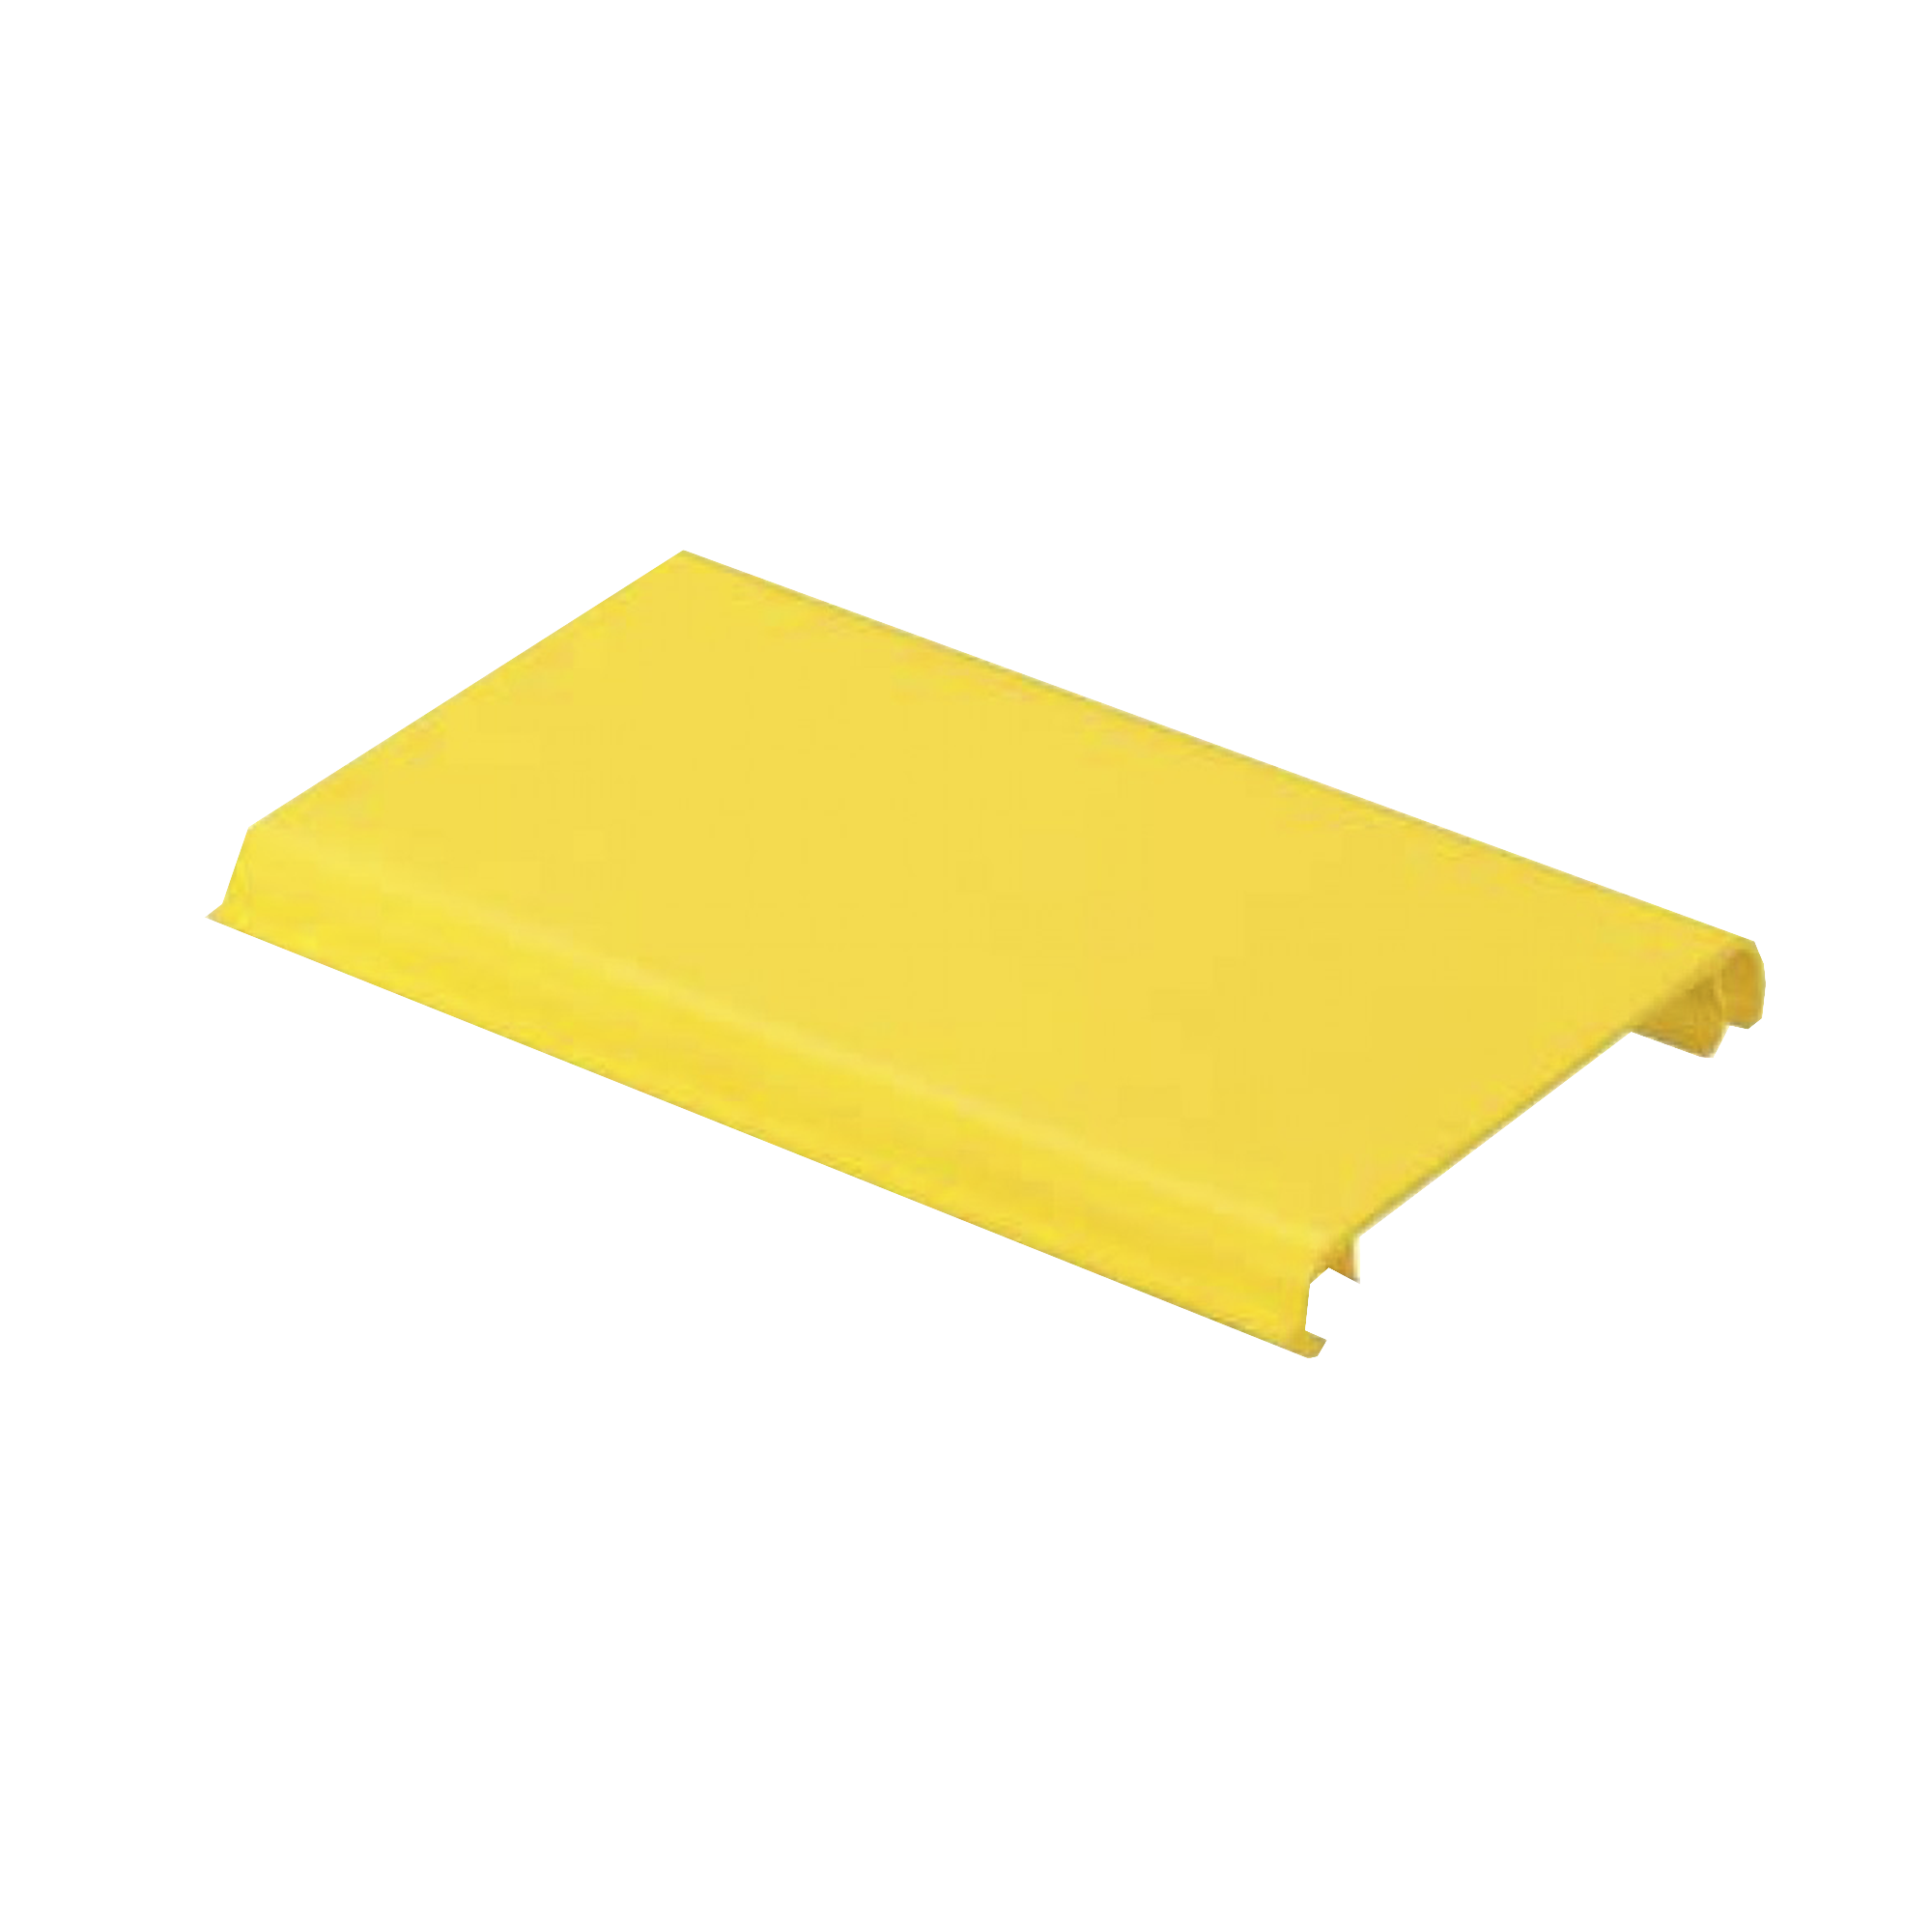 Tapa Con Bisagra a Presion Para Canaleta FiberRunner? FR4X4YL6, de PVC Rigido, Color Amarillo, 1.8 m de Largo